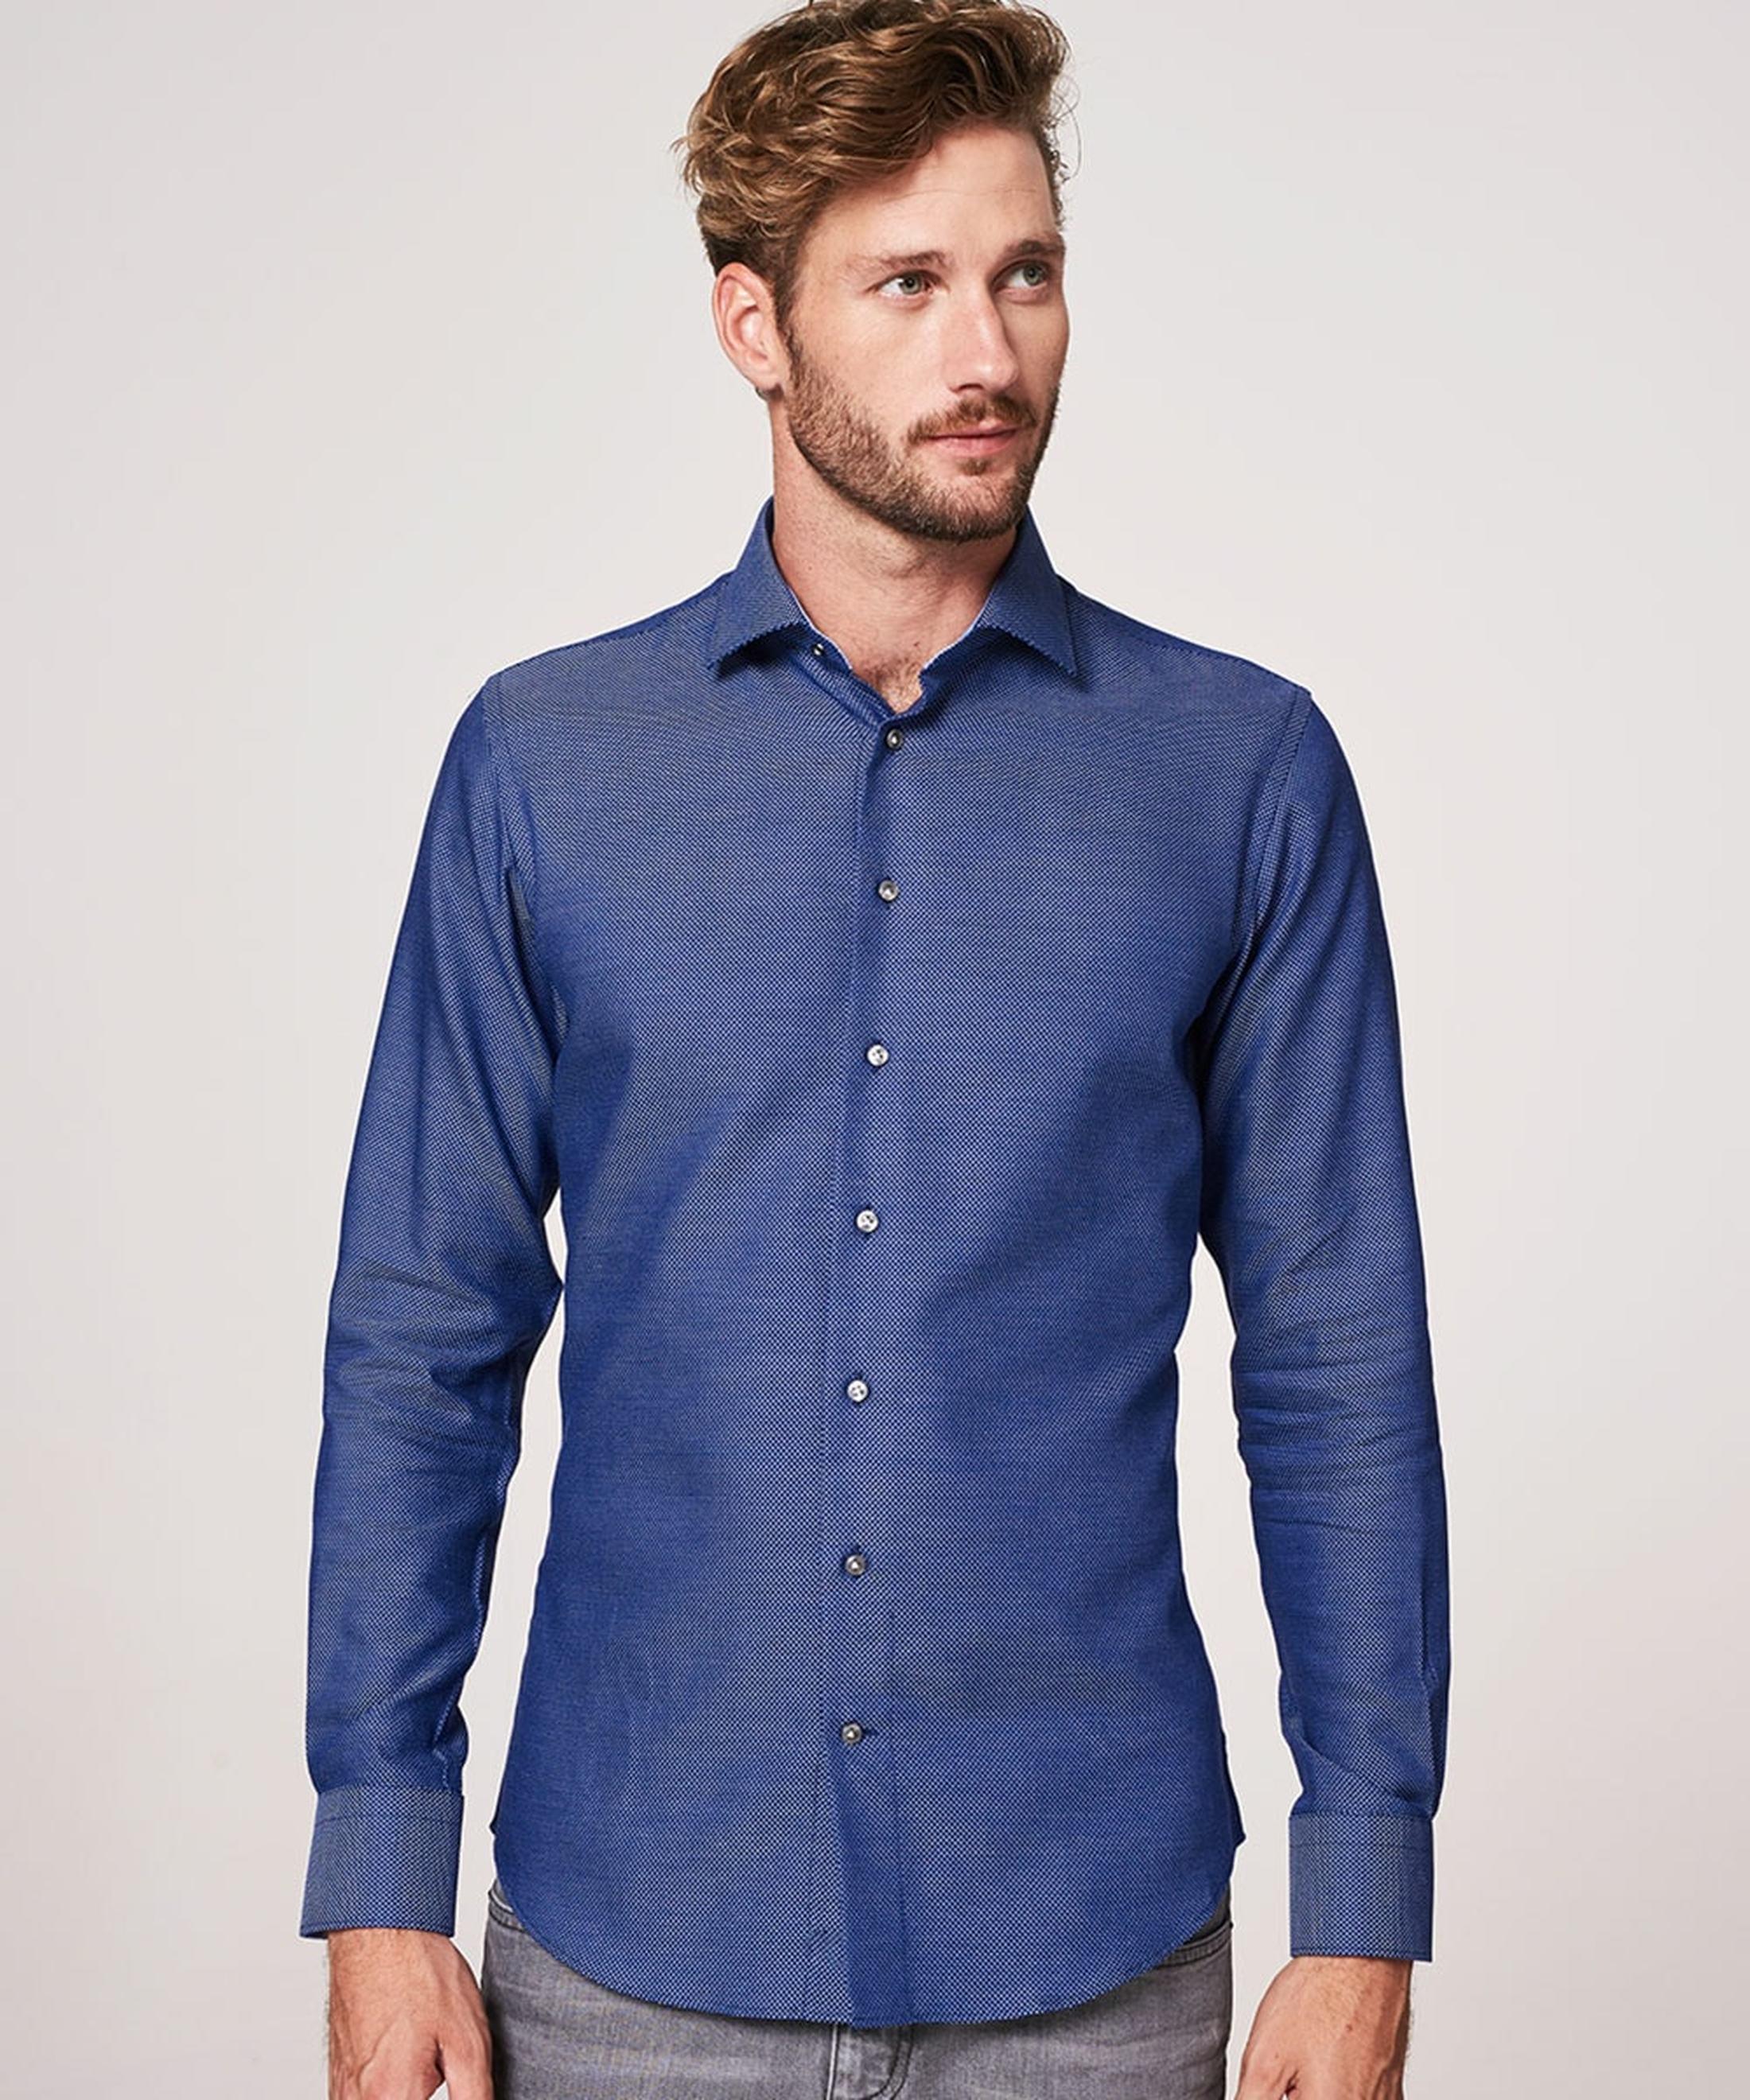 Profuomo Overhemd Oxford Navy Dessin foto 4